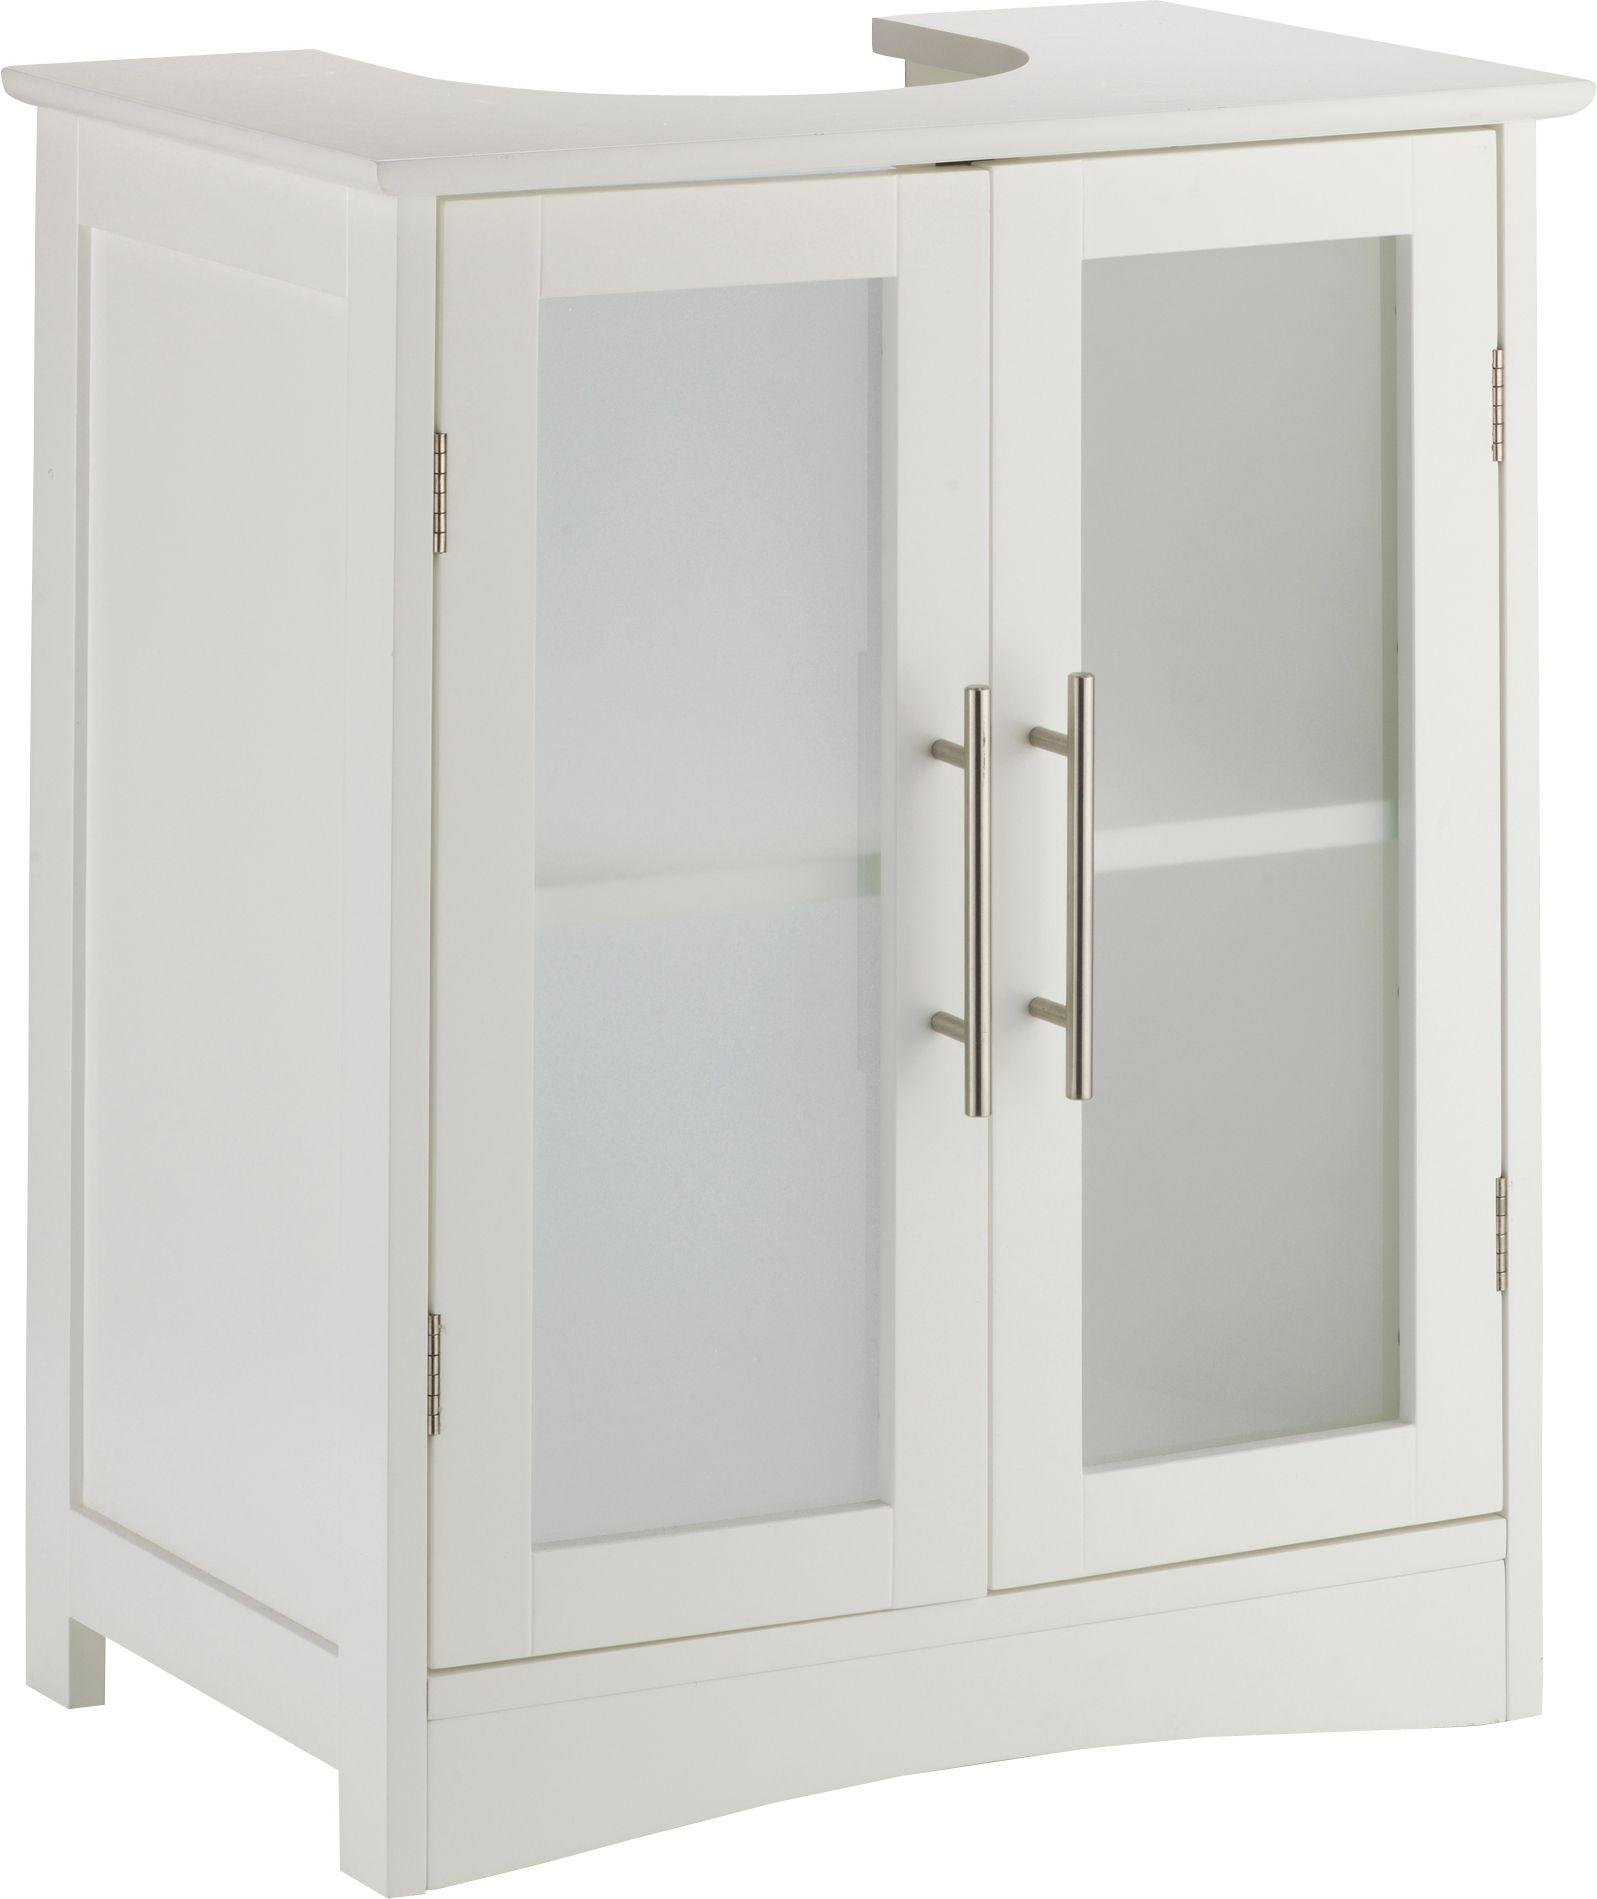 White Under Sink Basin Storage Vanity Unit Bathroom Cabinet Cupboard Caddy Shelf Ebay